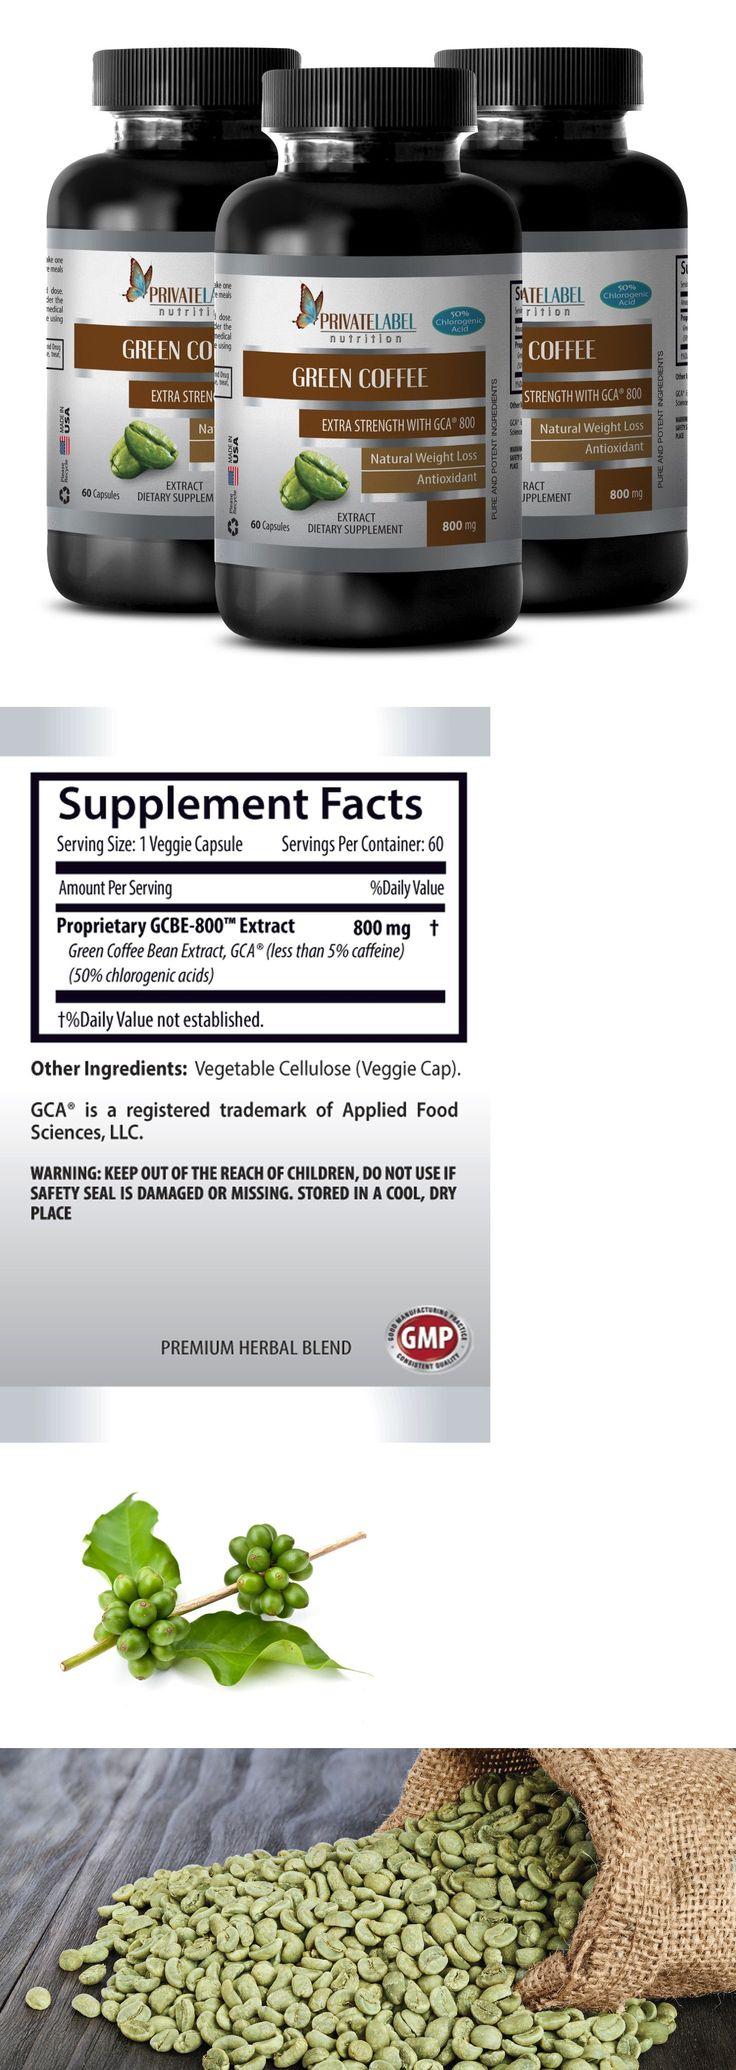 Appetite Control Suppressants: Fat Burner Pills Men - Green Coffee Gca® 800Mg 3B - Green Coffee Enema Kit -> BUY IT NOW ONLY: $31.95 on eBay!